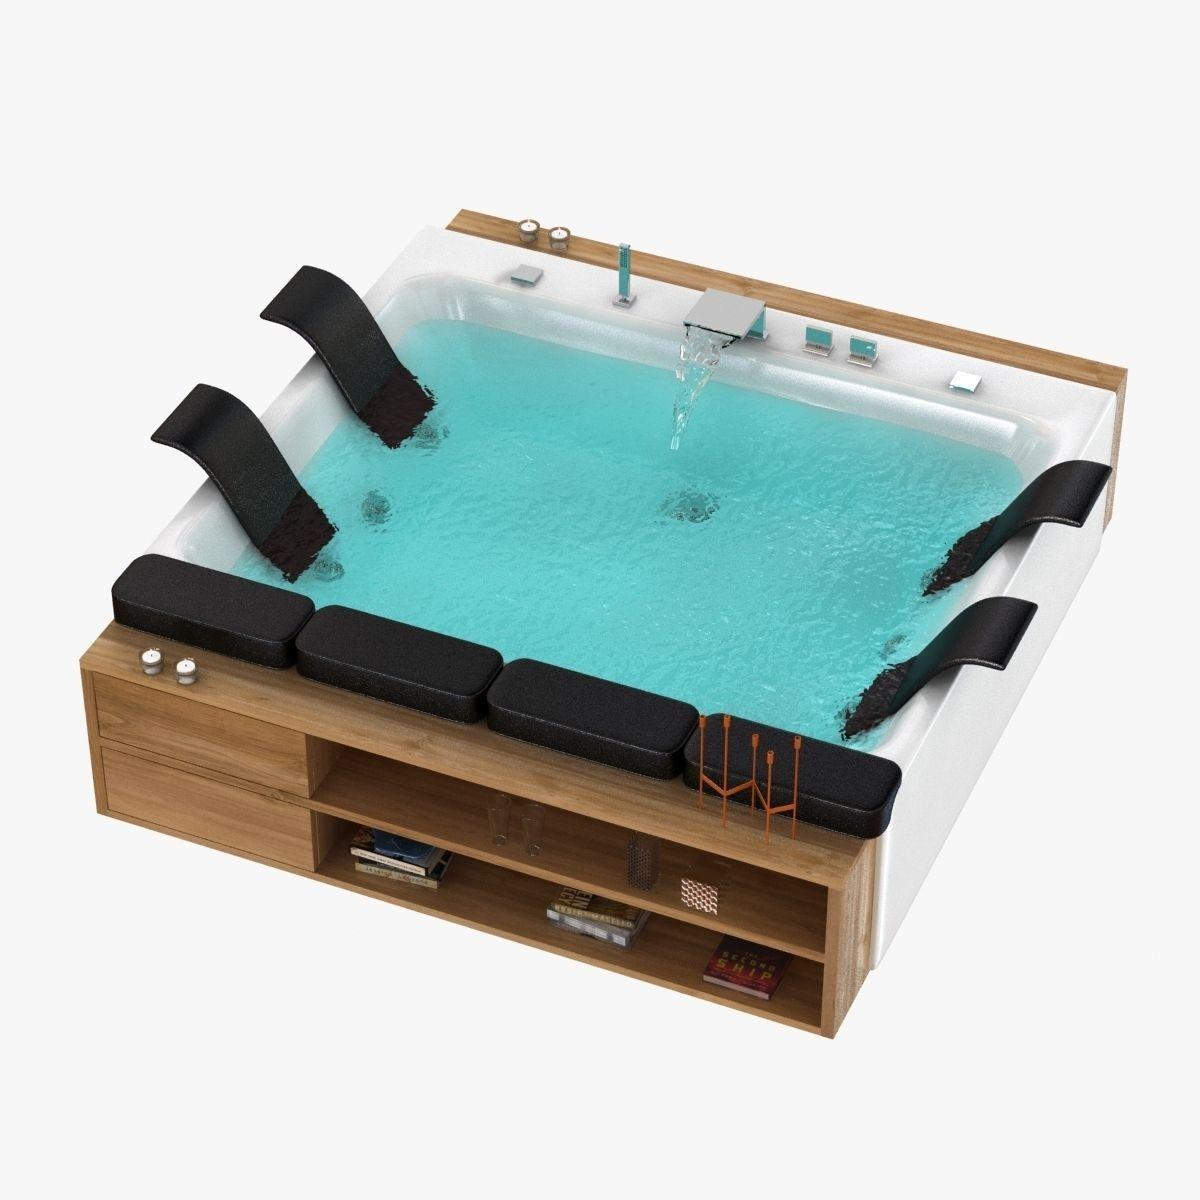 blubleu thais art bath jacuzzi 3D model | CGTrader